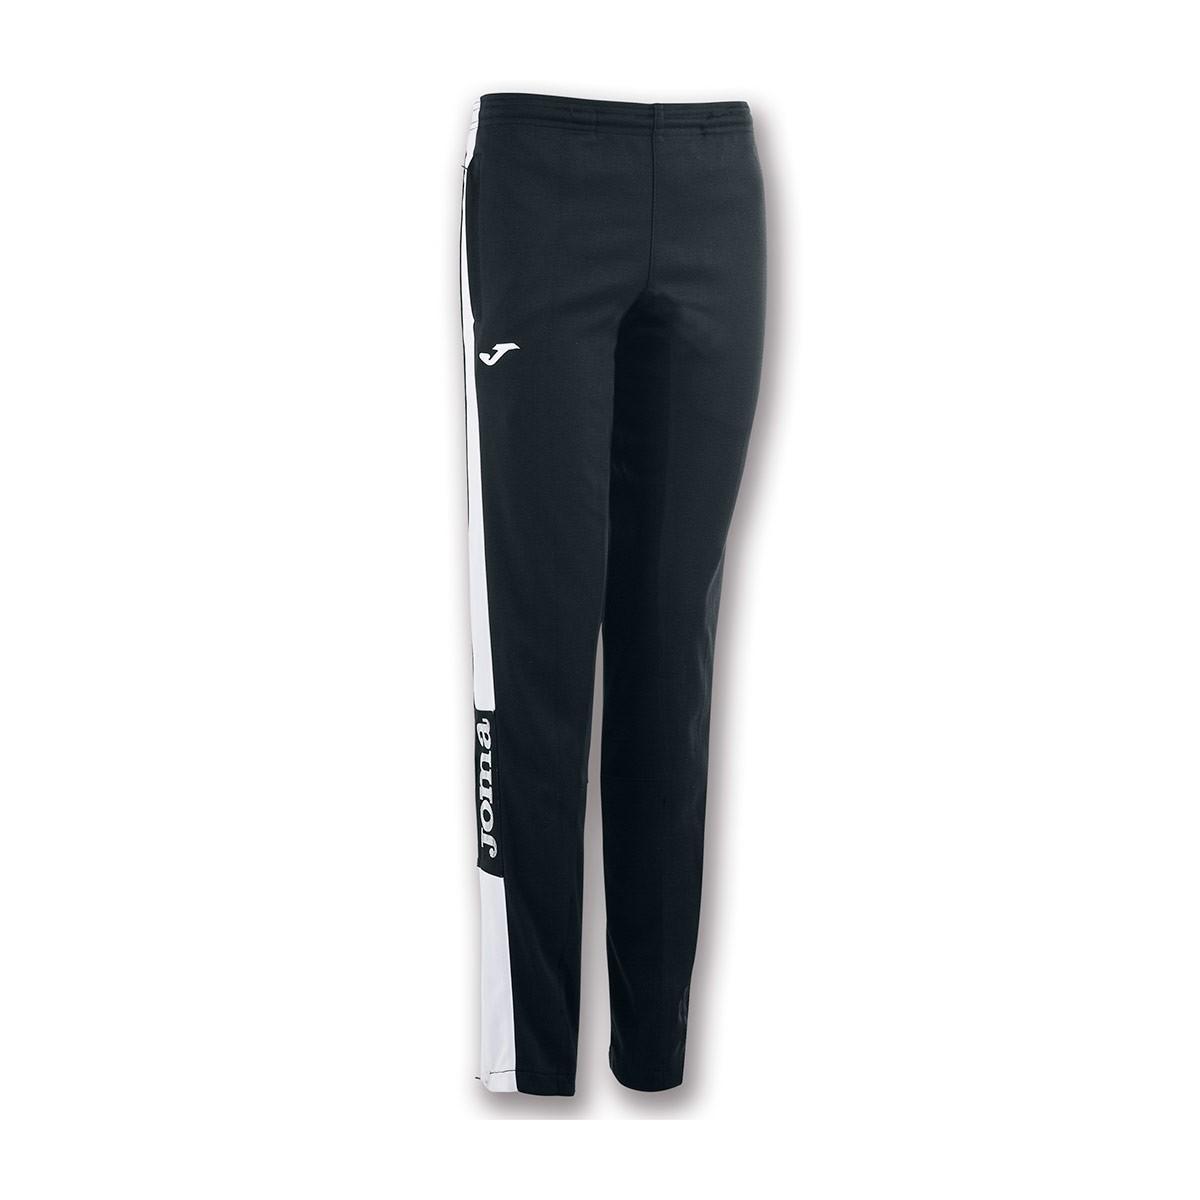 2c4775b13 Long pants Joma Woman Champion IV Black - Football store Fútbol Emotion